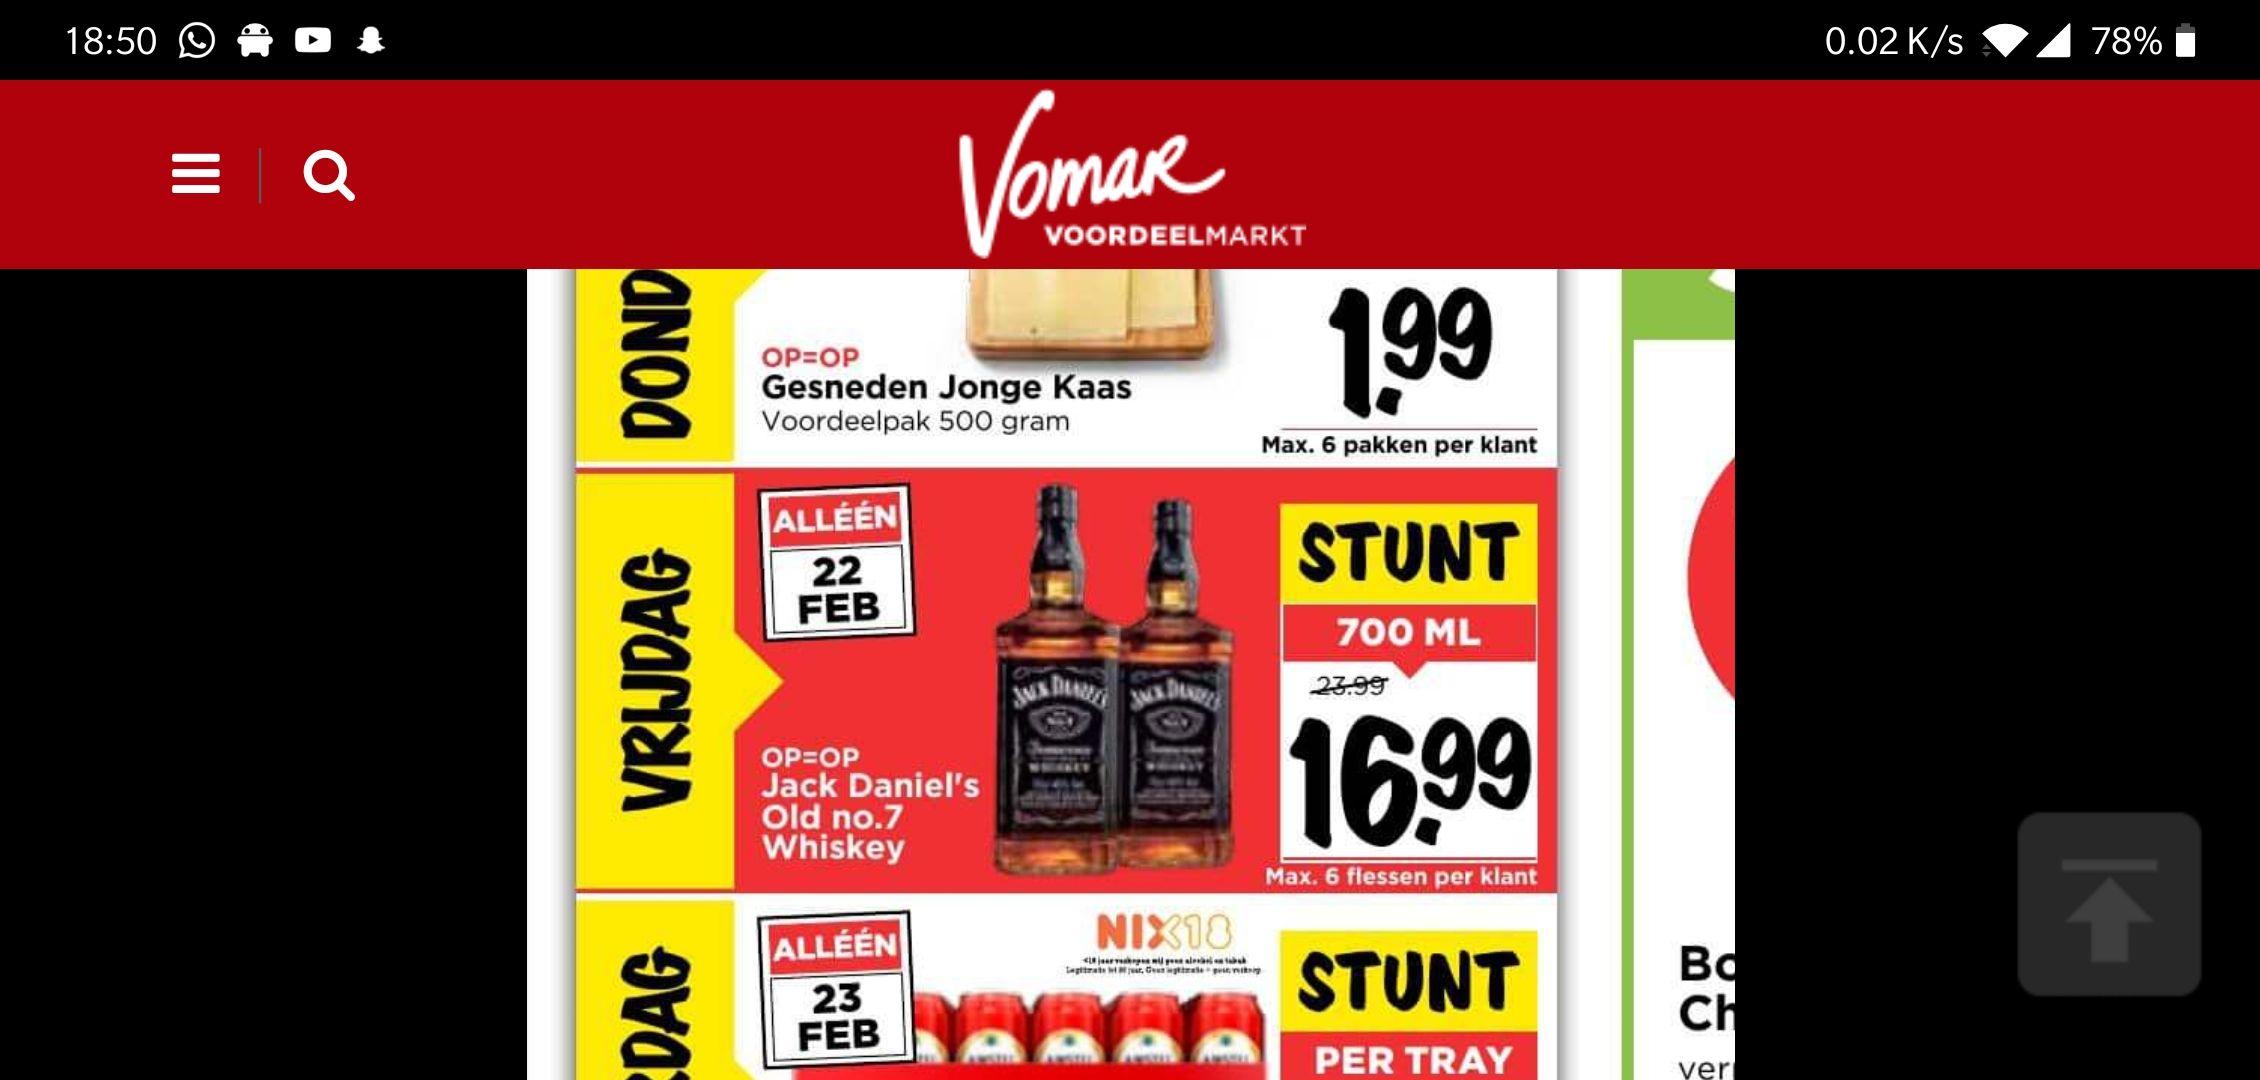 Dagdeal/stunt Jack Daniel's. Vomar Supermarkt